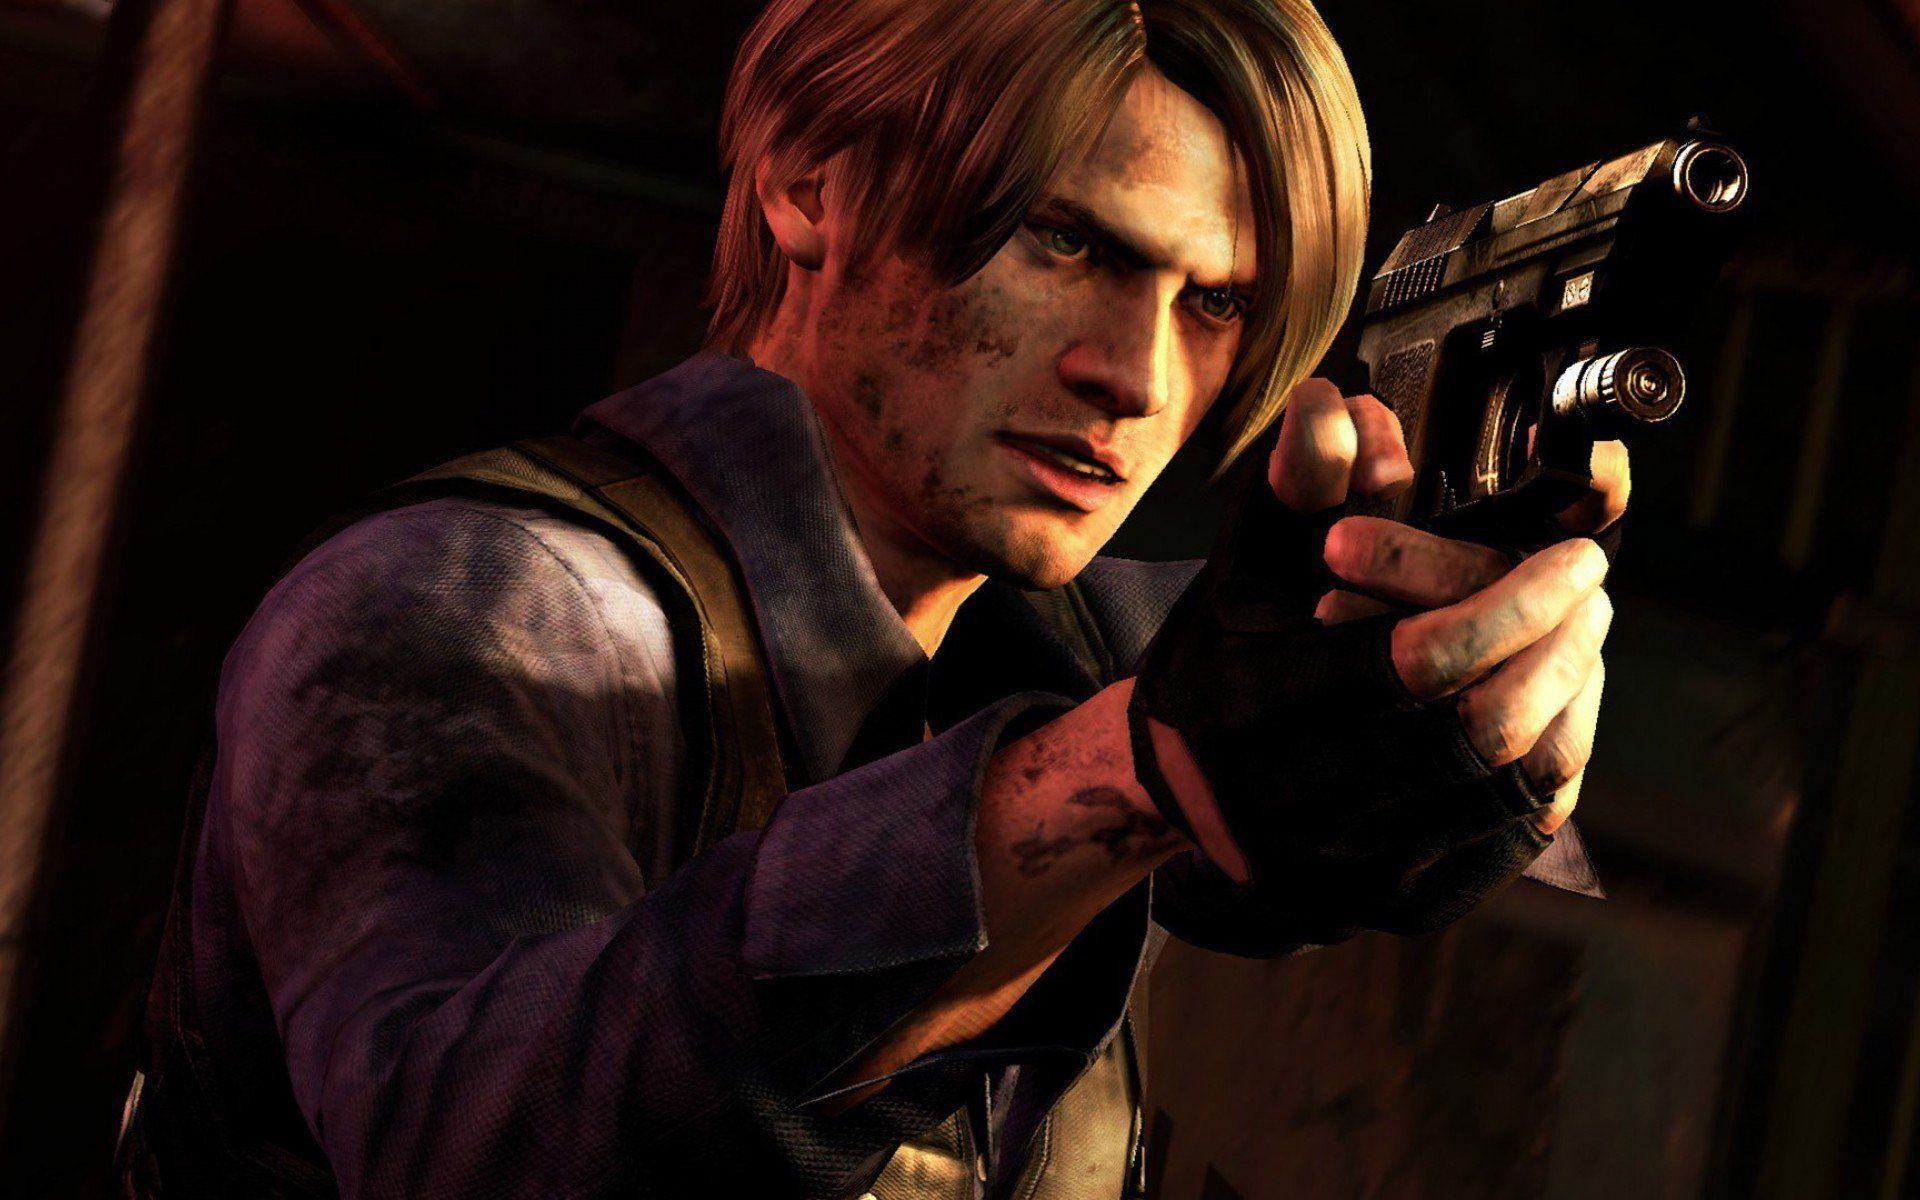 Leon Resident Evil 6 Wallpapers - Wallpaper Cave